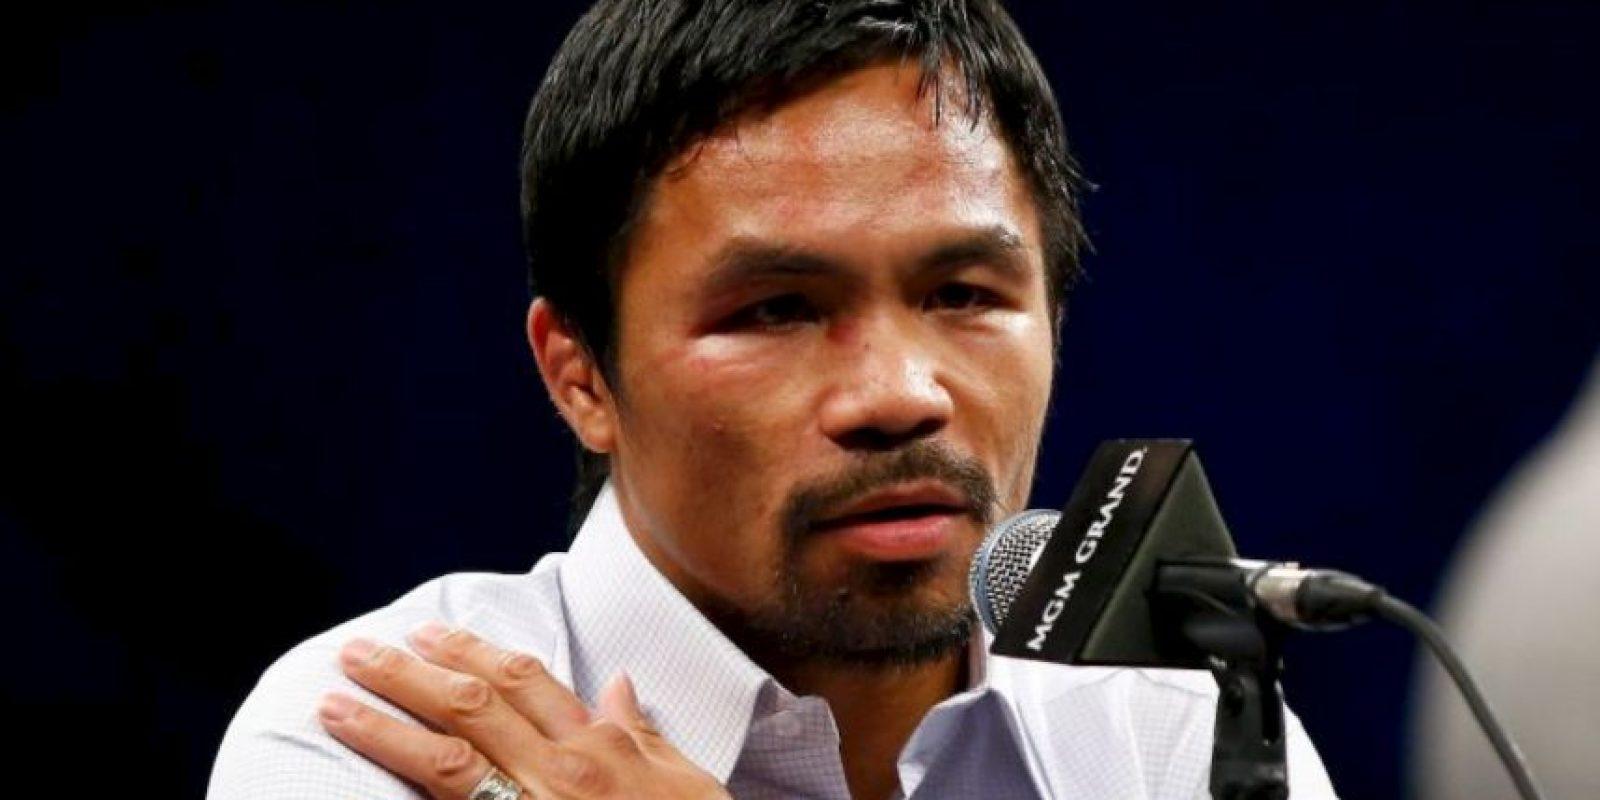 Manny Pacquio se metió en una gran polémica Foto:Getty Images